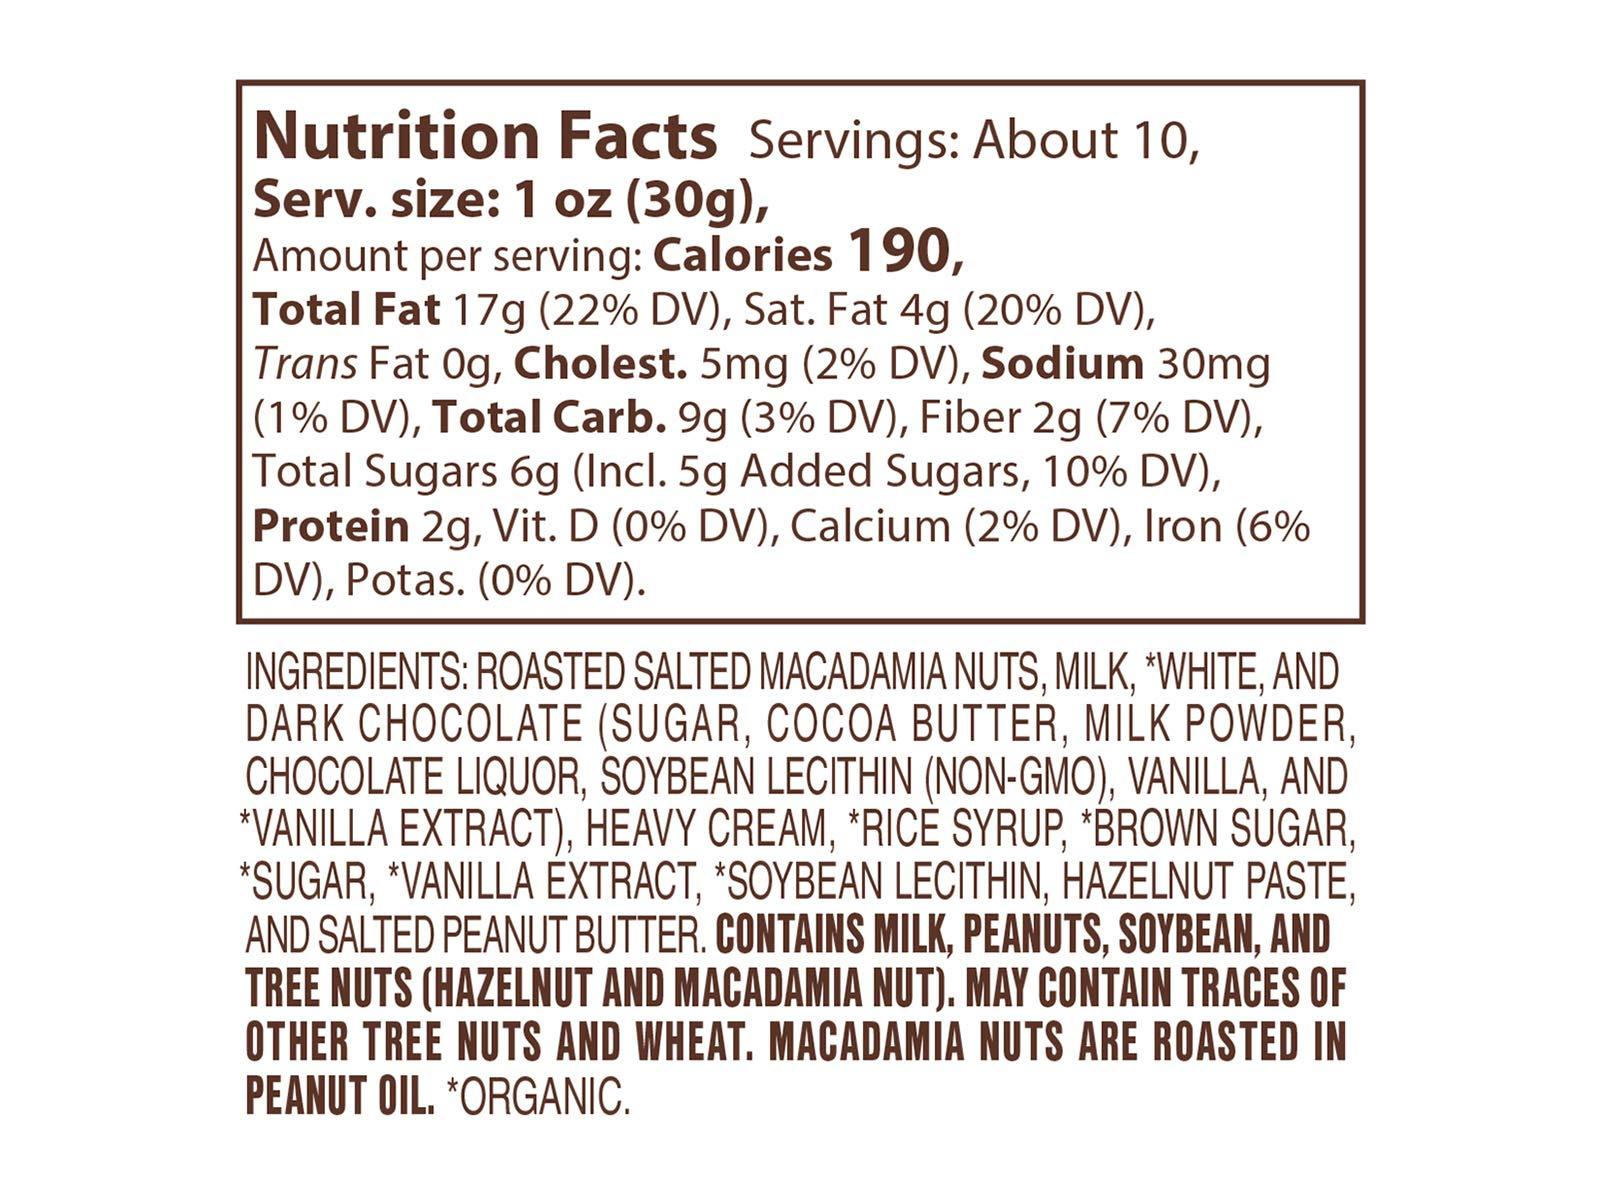 Lake Champlain Milk Chocolate Macadamia Nut Caramel Clusters, 6 Pieces, 10.25 Ounces by Lake Champlain Chocolates